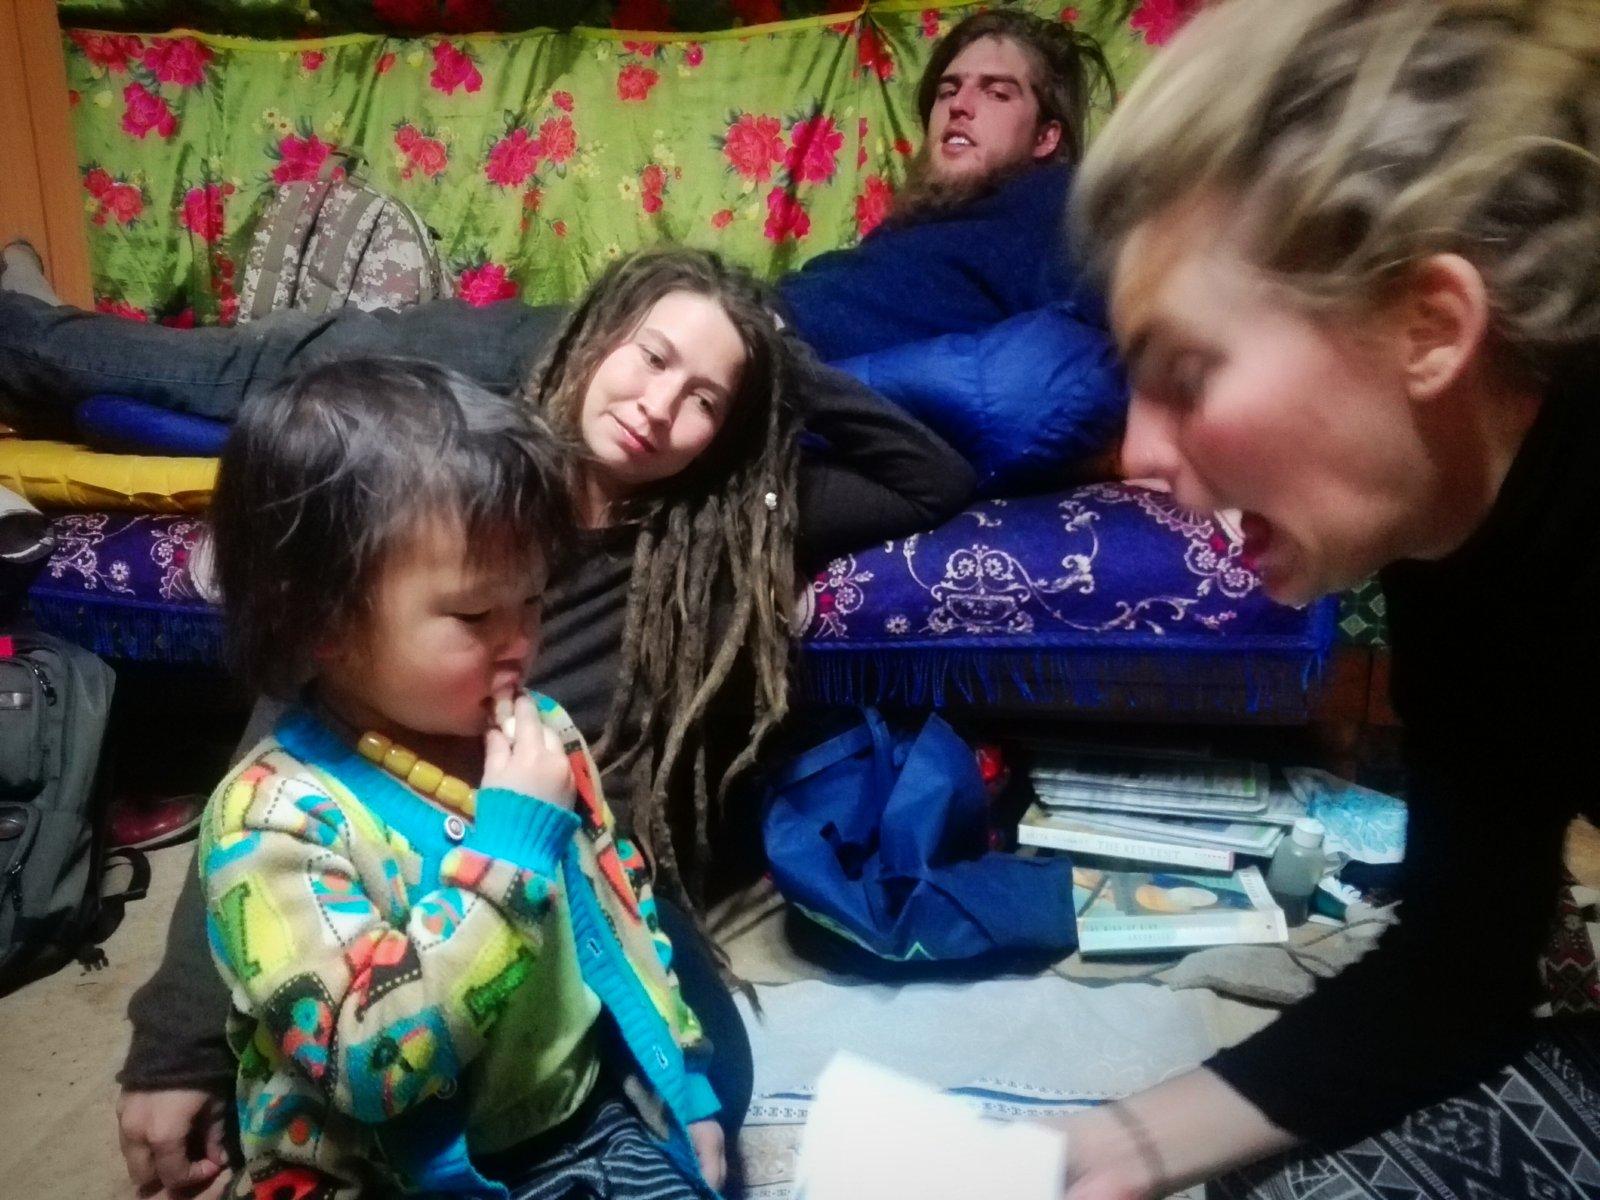 img_20160518_005204-jpg.30615_Mongolia Rainbow Horse Caravan_Travel Stories_Squat the Planet_2:55 AM